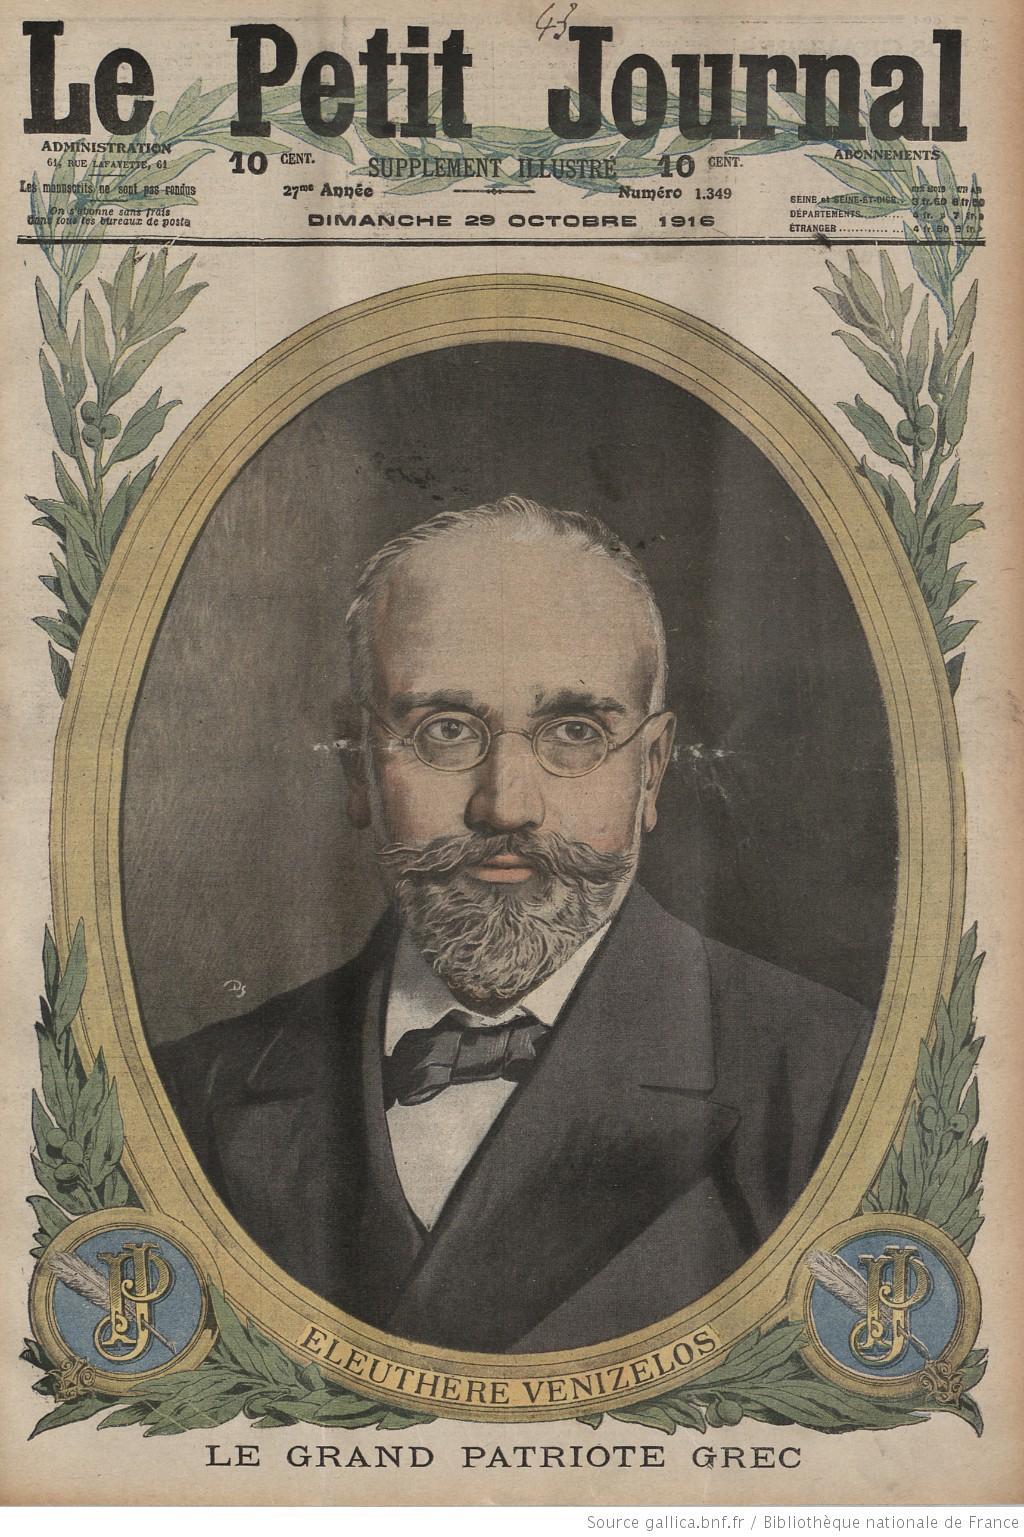 LPJ Illustre 1916-10-29 A.jpg